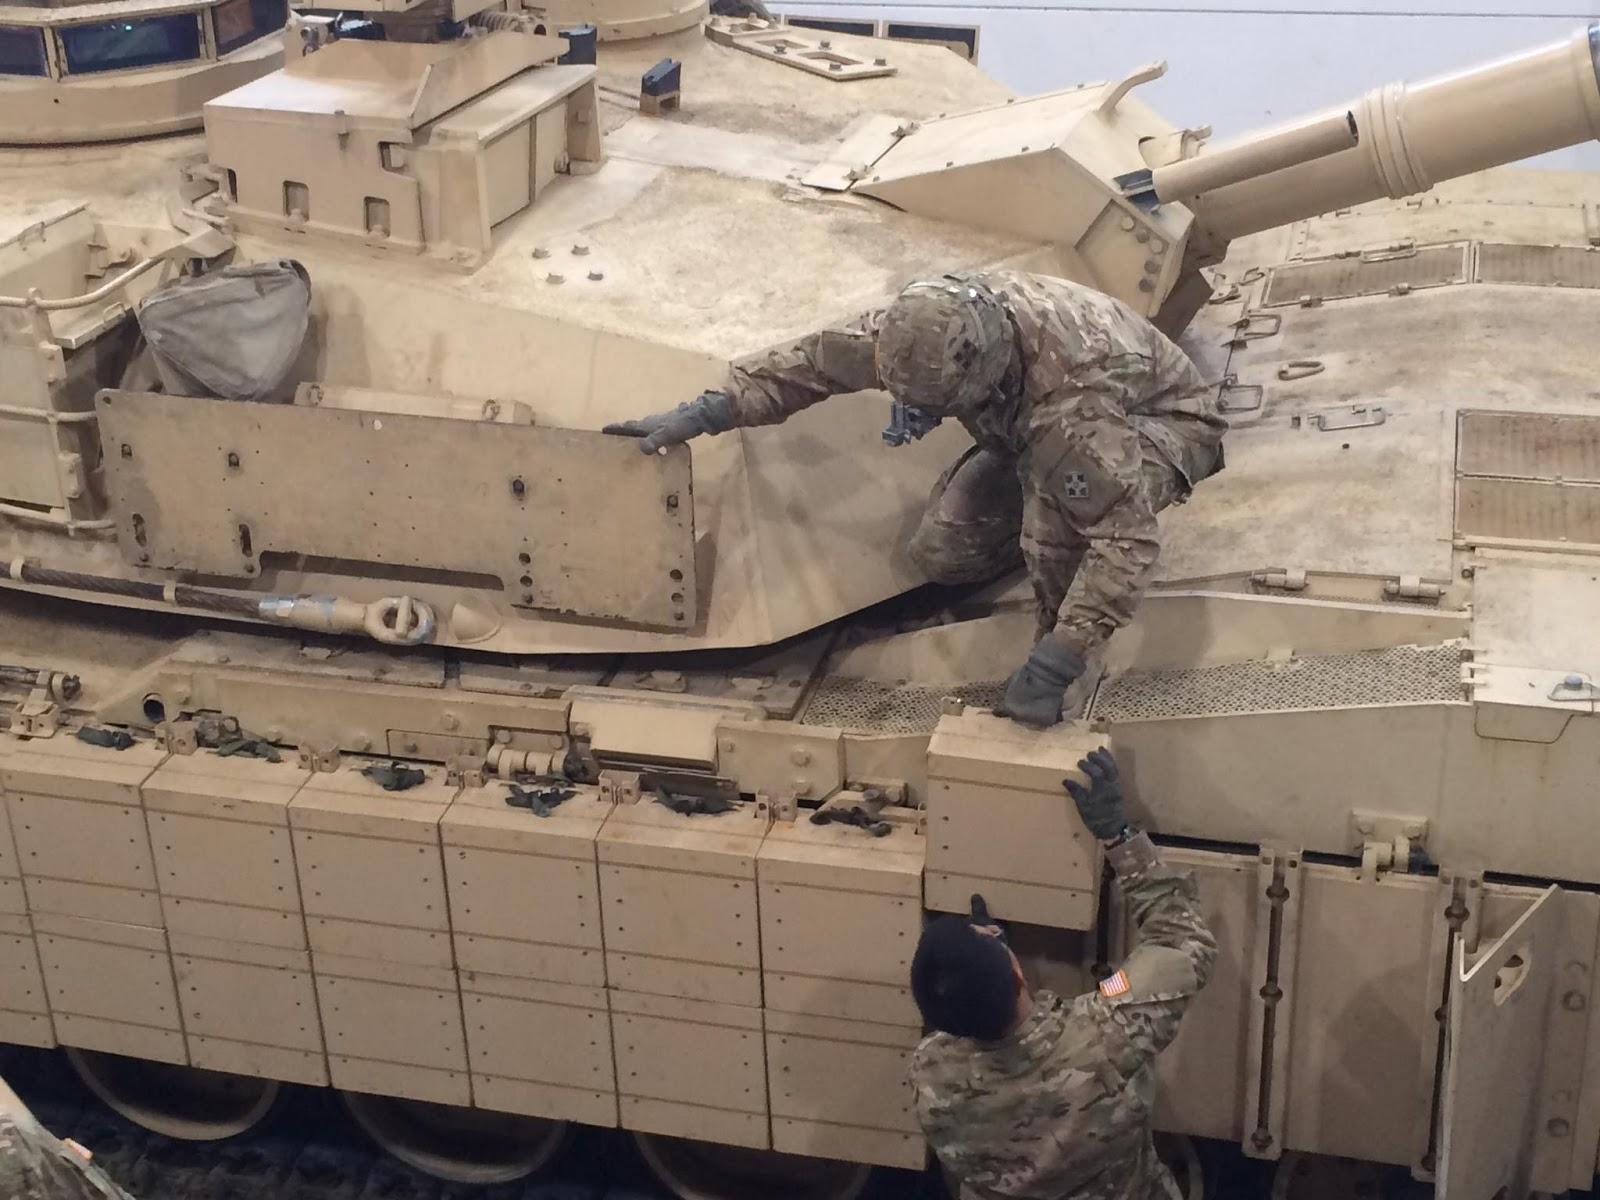 tough sf innovating in armor